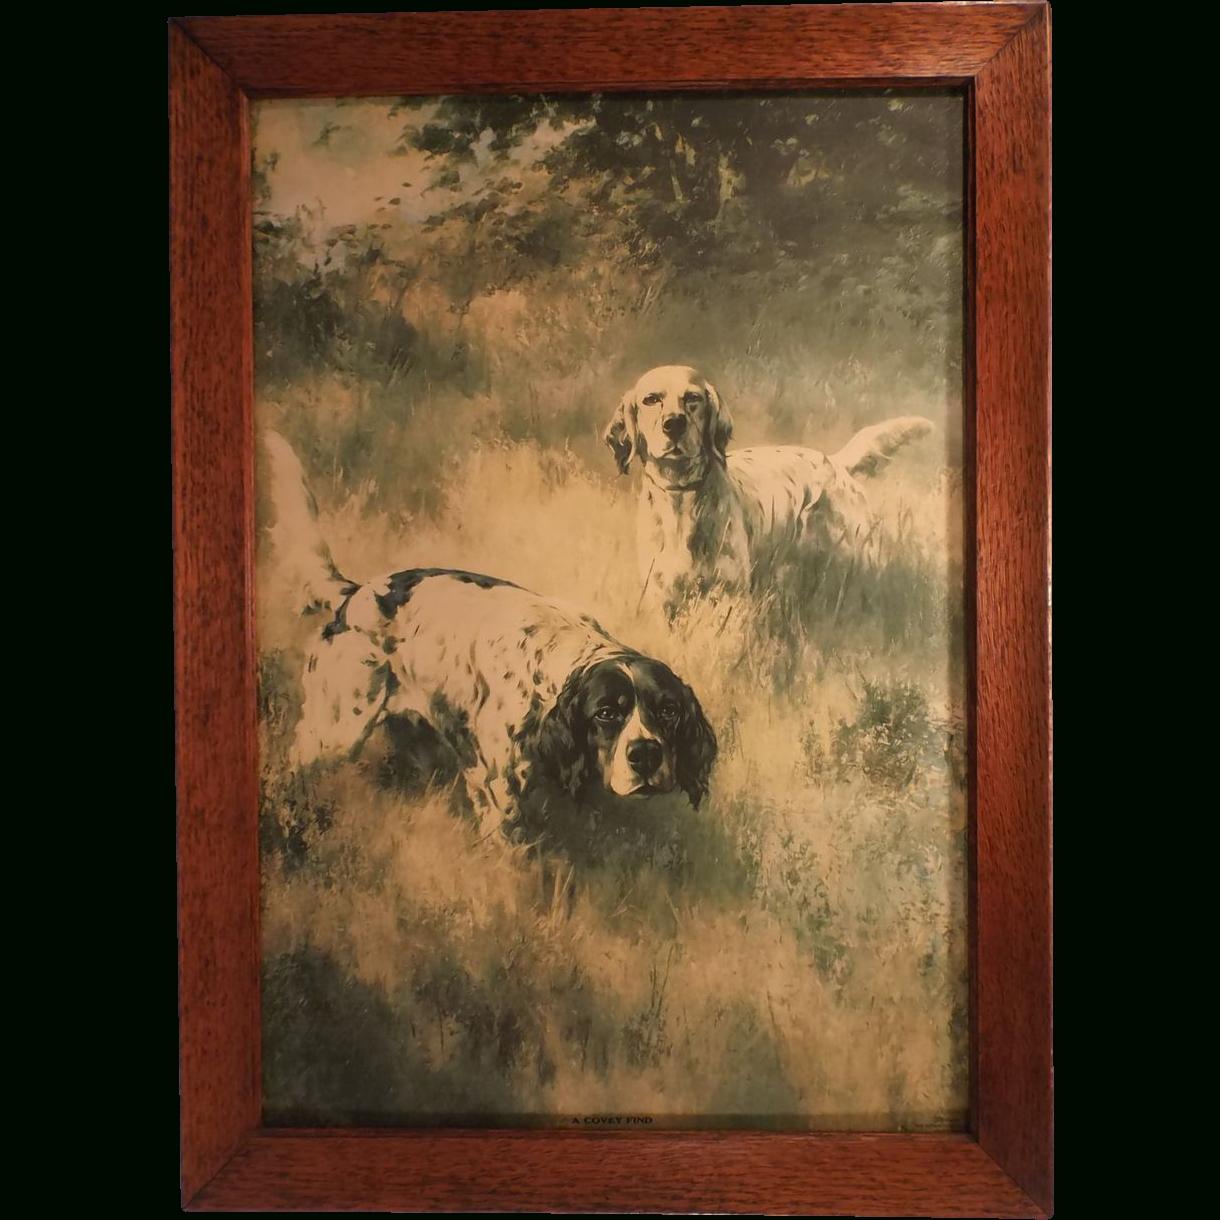 A Covey Find, Vintage Fine Art Framed Hunting Dog Print, Percival In Recent Dog Art Framed Prints (View 6 of 15)